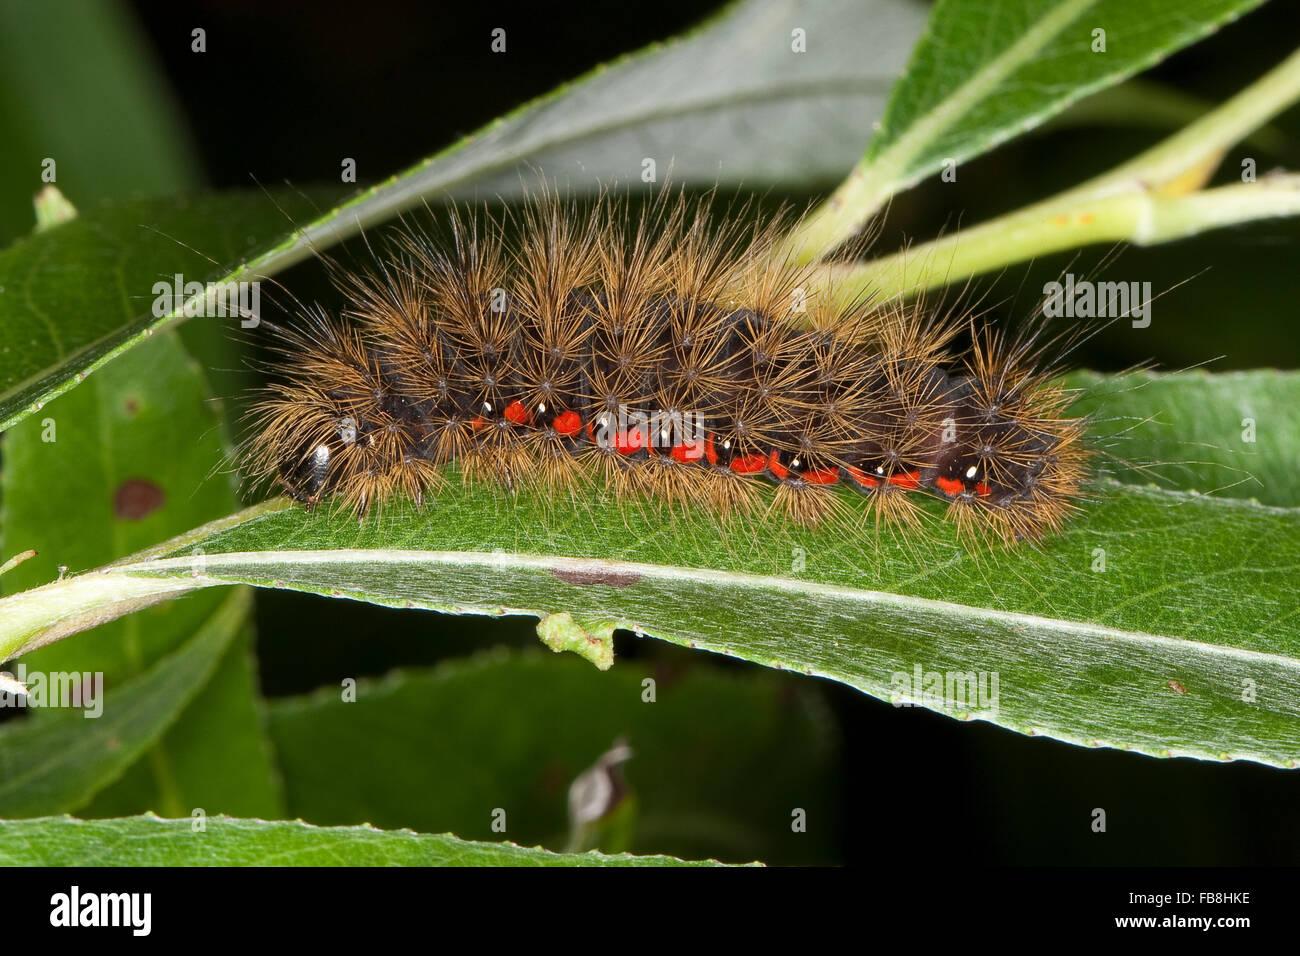 Light Knot Grass, caterpillar, Heidemoor-Rindeneule, Fieberklee-Sumpfeule, Raupe, Acronicta menyanthidis, Apatele menyanthidis Stock Photo